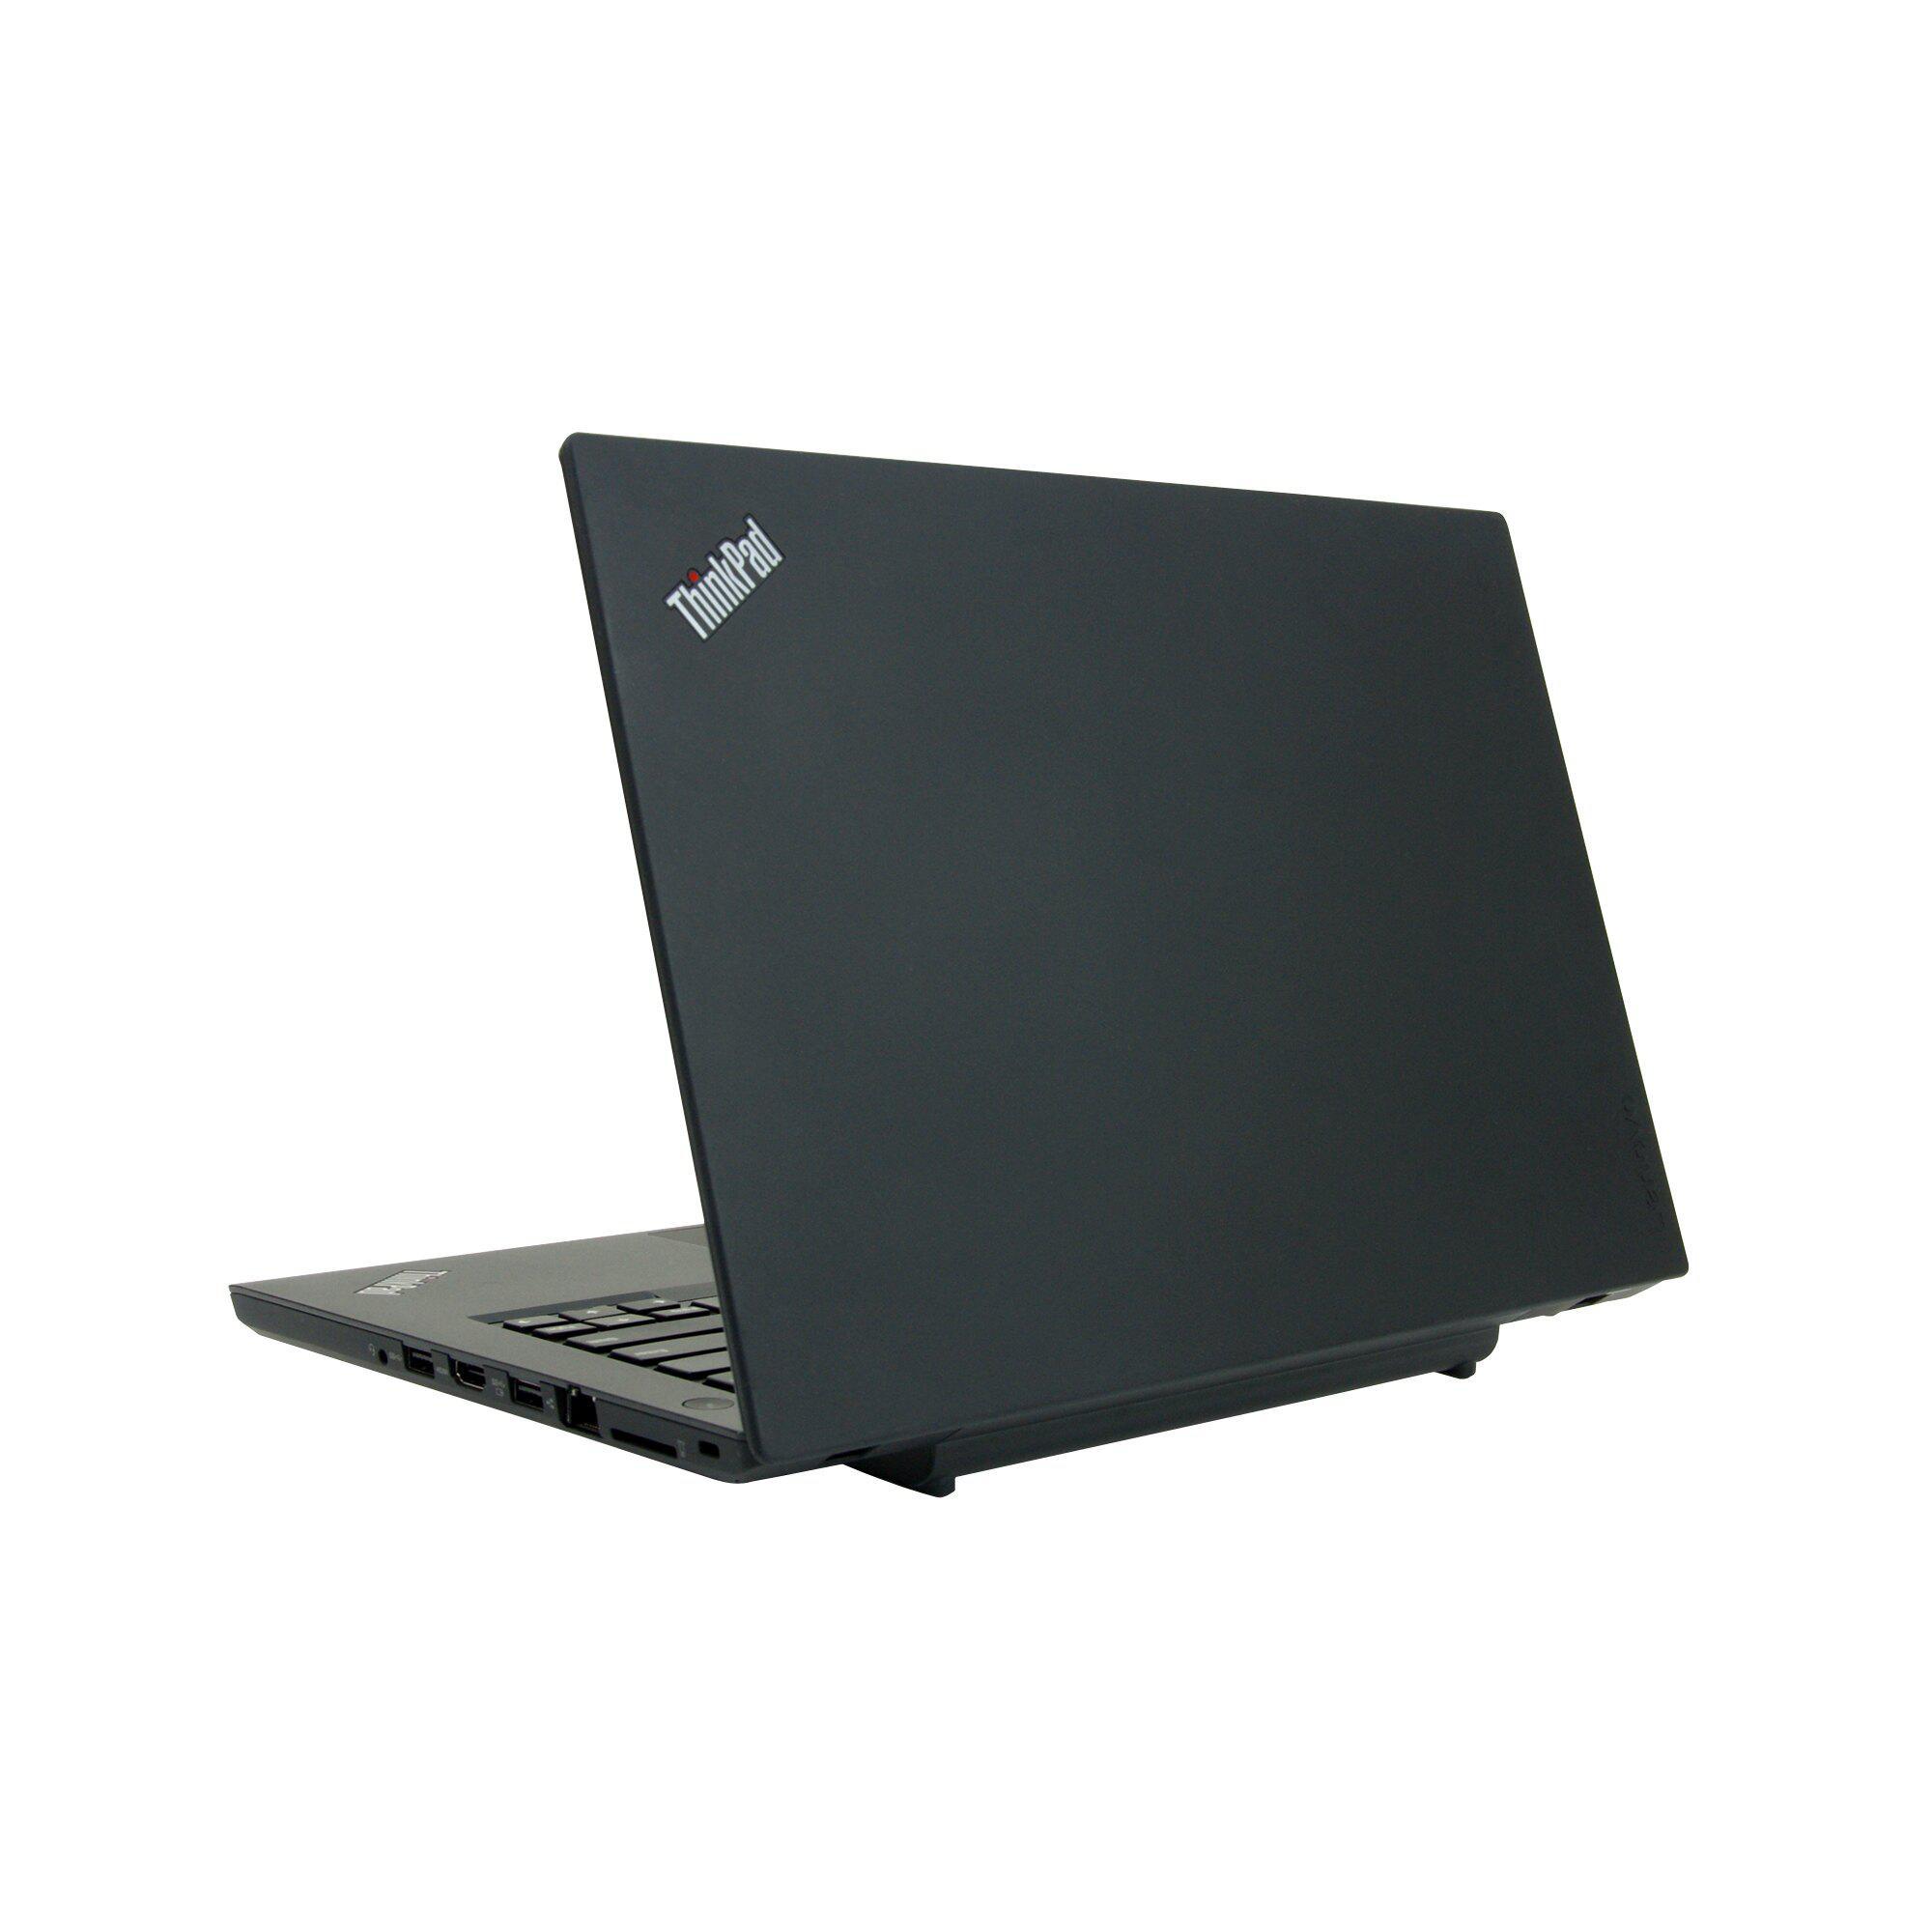 Lenovo Thinkpad T470 14-inch (2016) - Core i5-6300U - 8 GB - SSD 256 GB